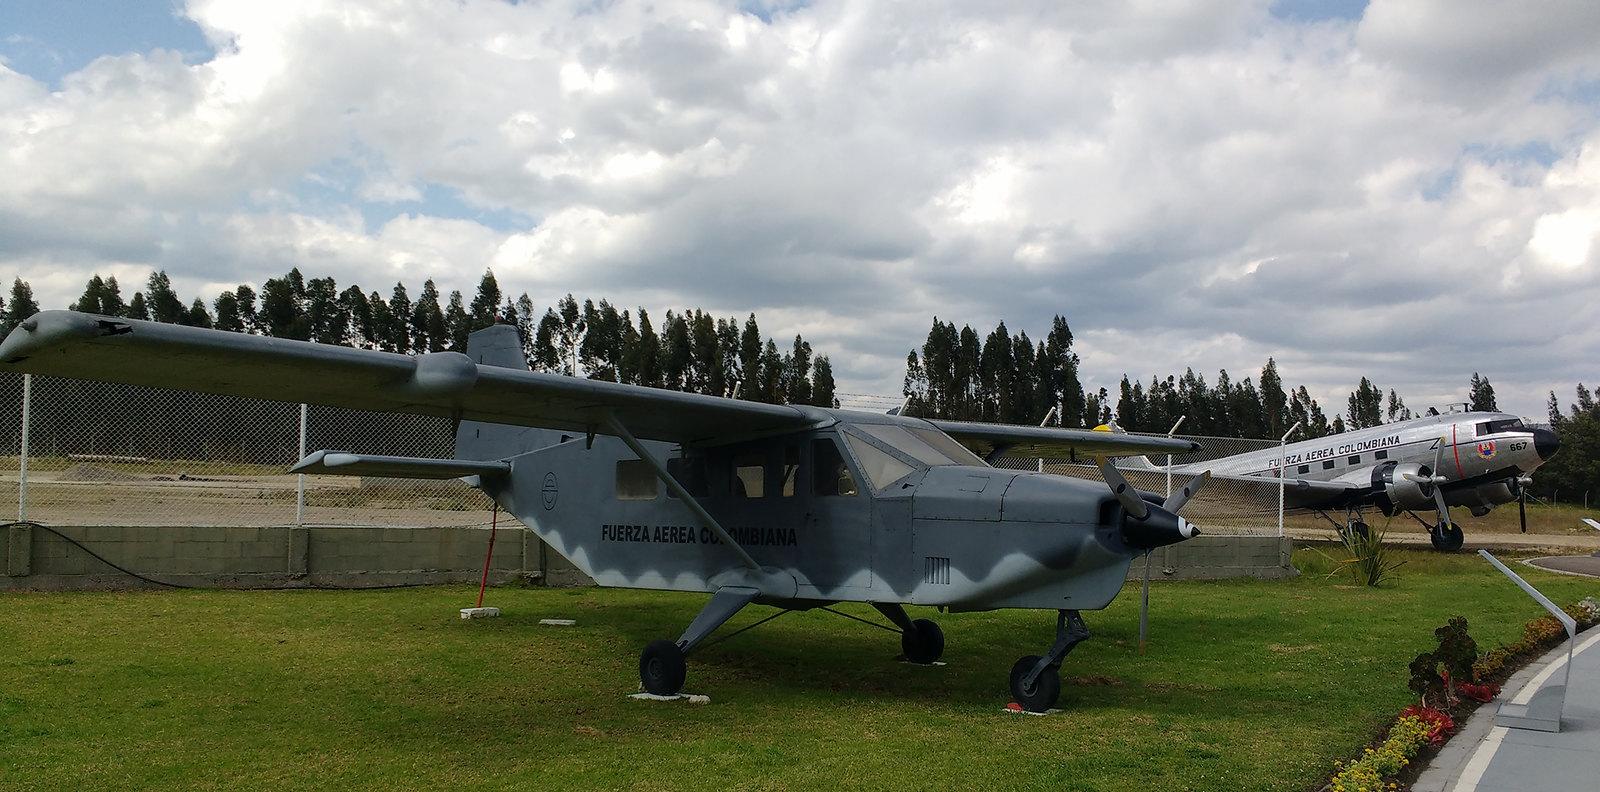 12. Gavilan-358